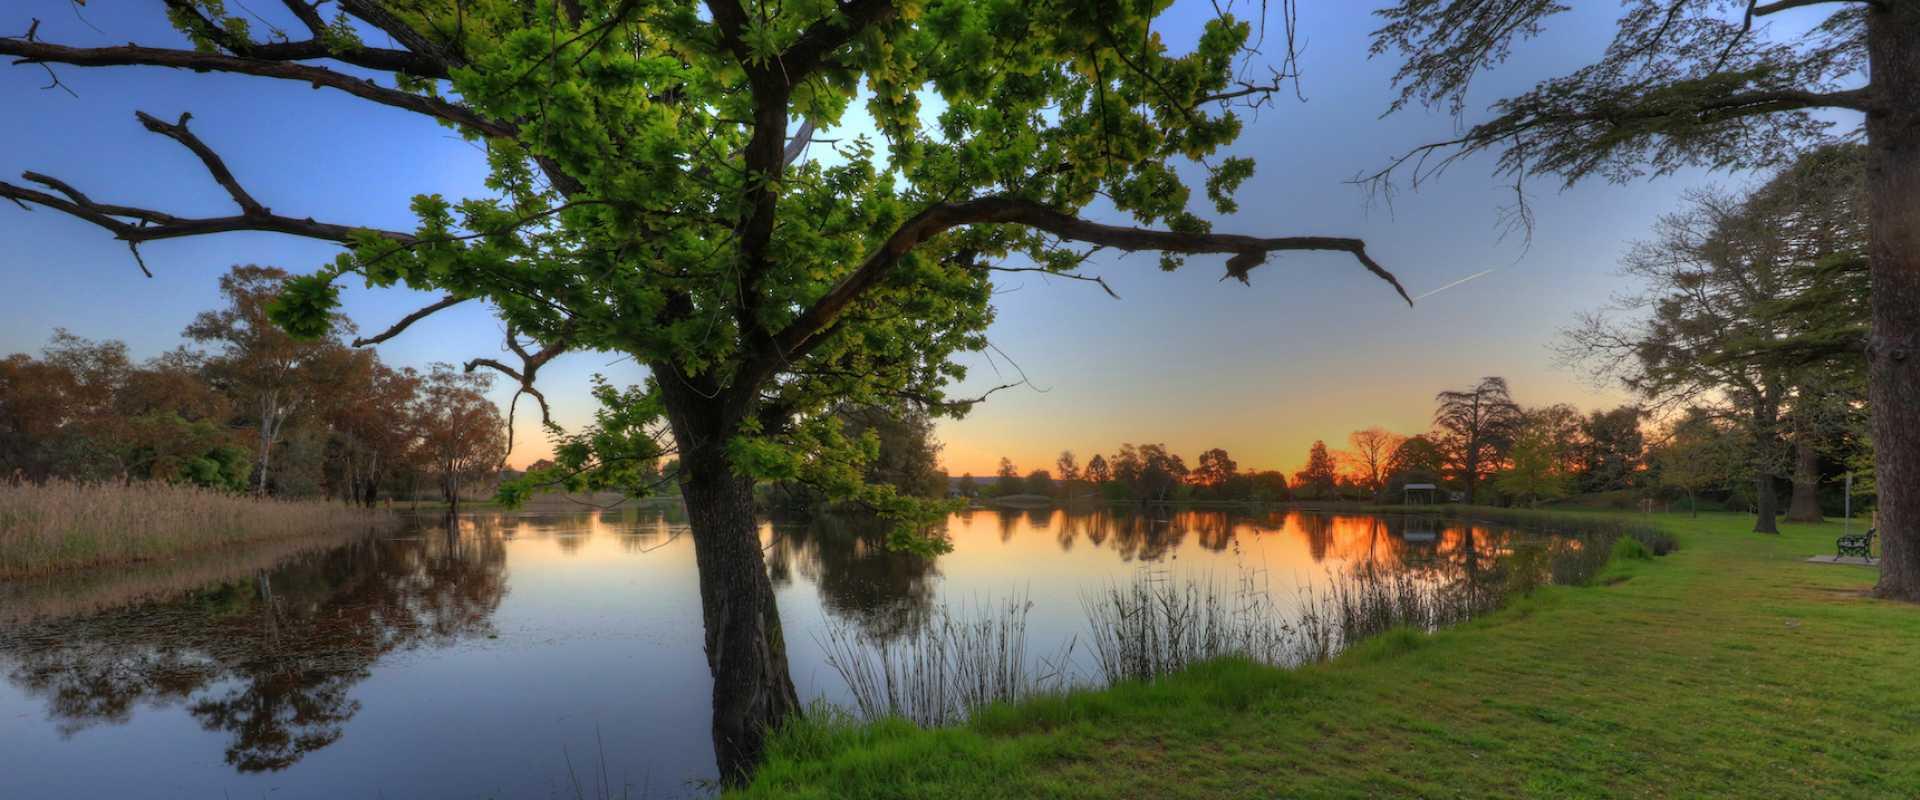 Kui Parks, Lake Anderson Caravan Park, Chiltern VIC